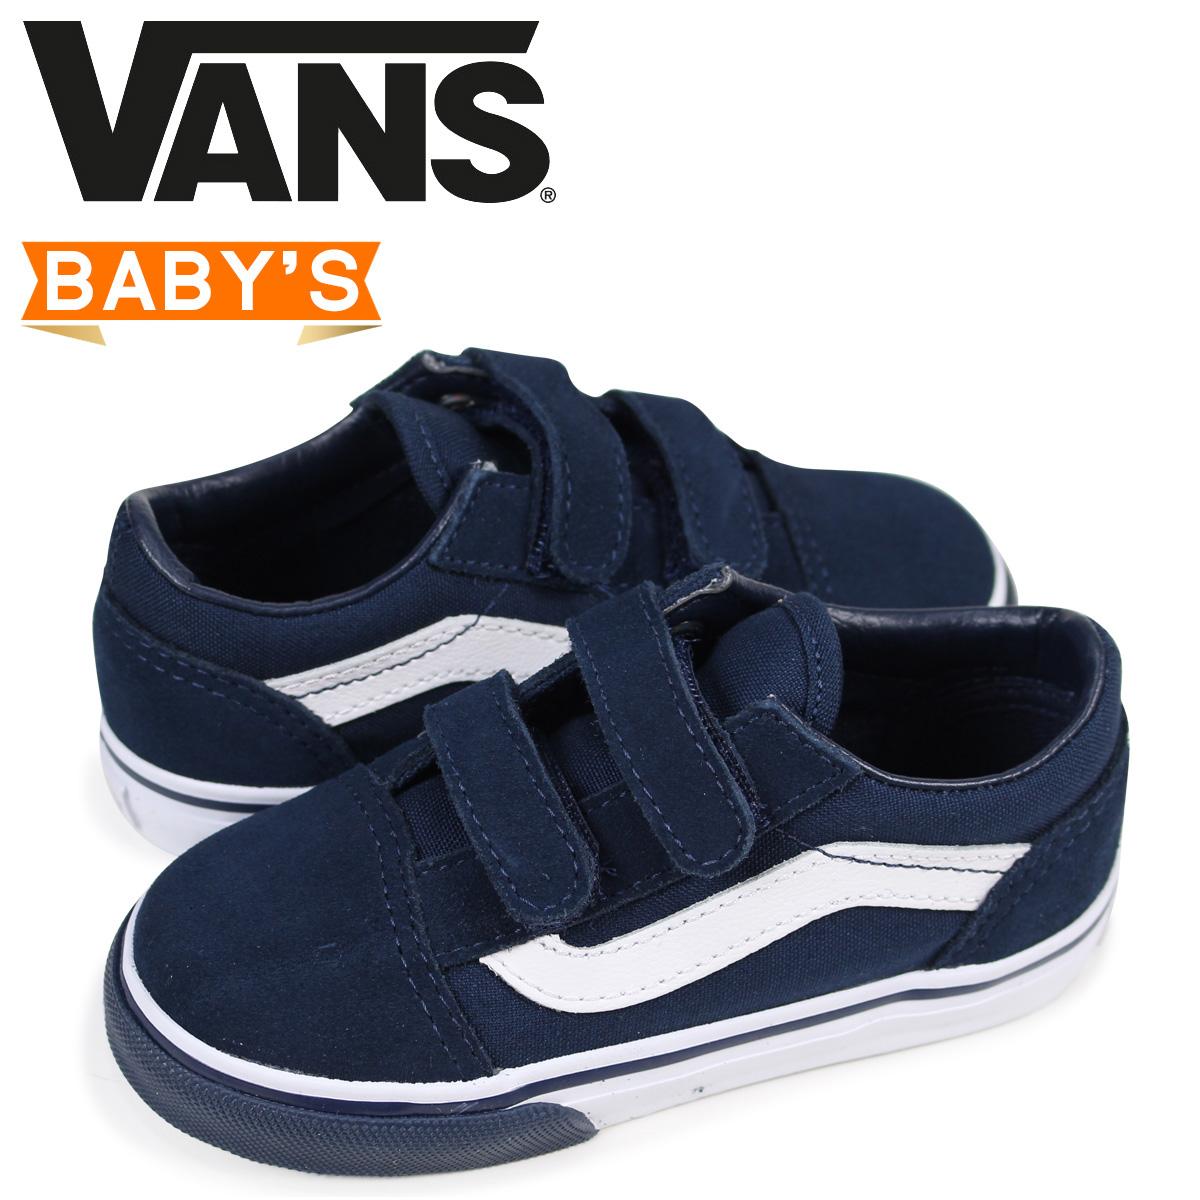 a2dcacb25c4968 SneaK Online Shop  VANS old school sneakers baby vans station wagons ...